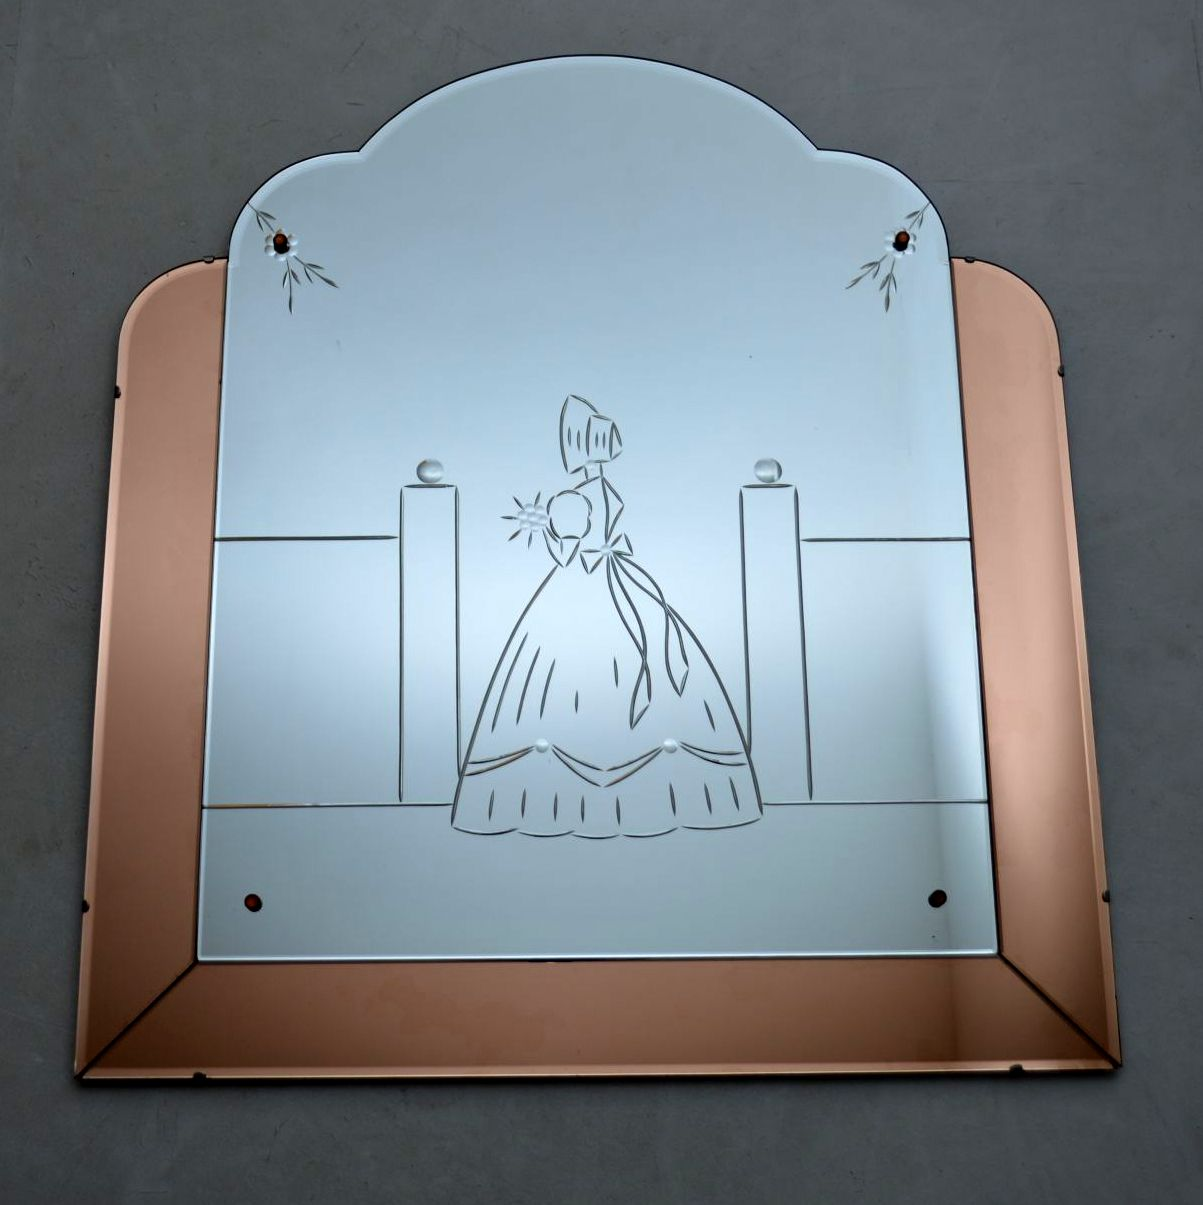 Art Deco Etched Glass Over Mantle Mirror Vintage 1920 S Retrospective Interiors Retro Furniture Vintage Mid Century Furniture Vintage Danish Modern Furniture Antique Furniture London